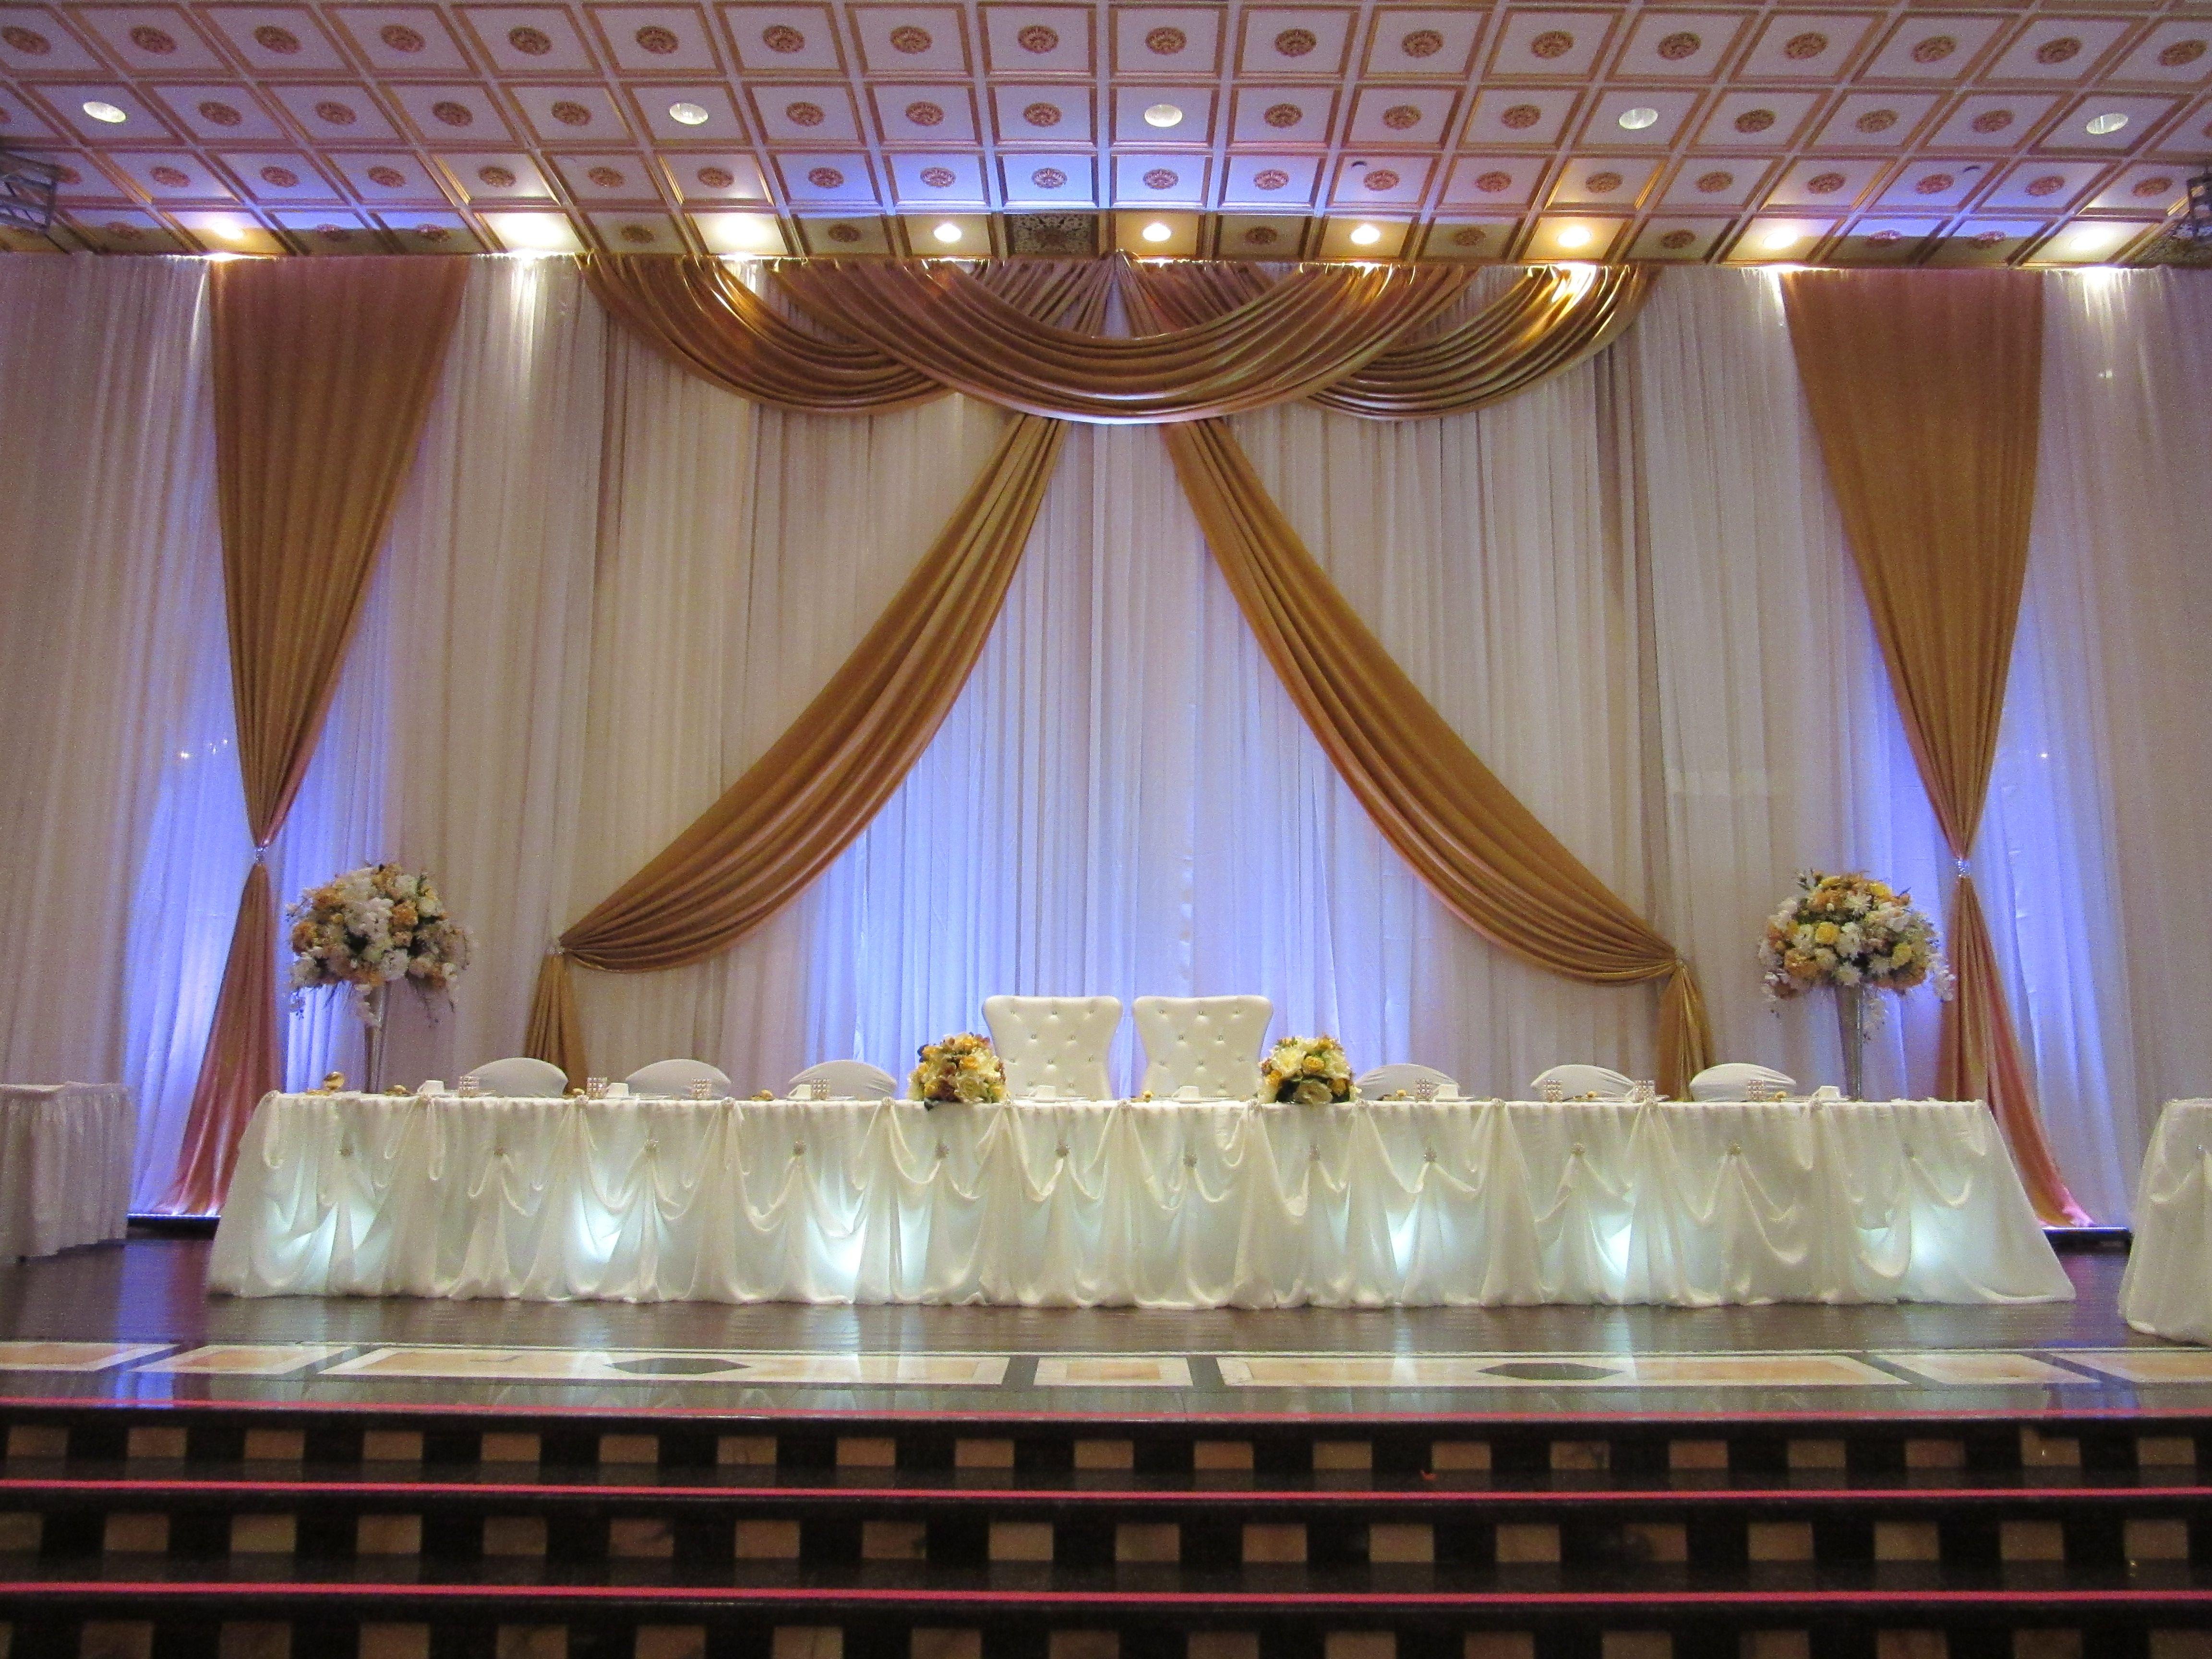 Gold Wedding Backdrop Design Done Through Weds By Mega City Wedding